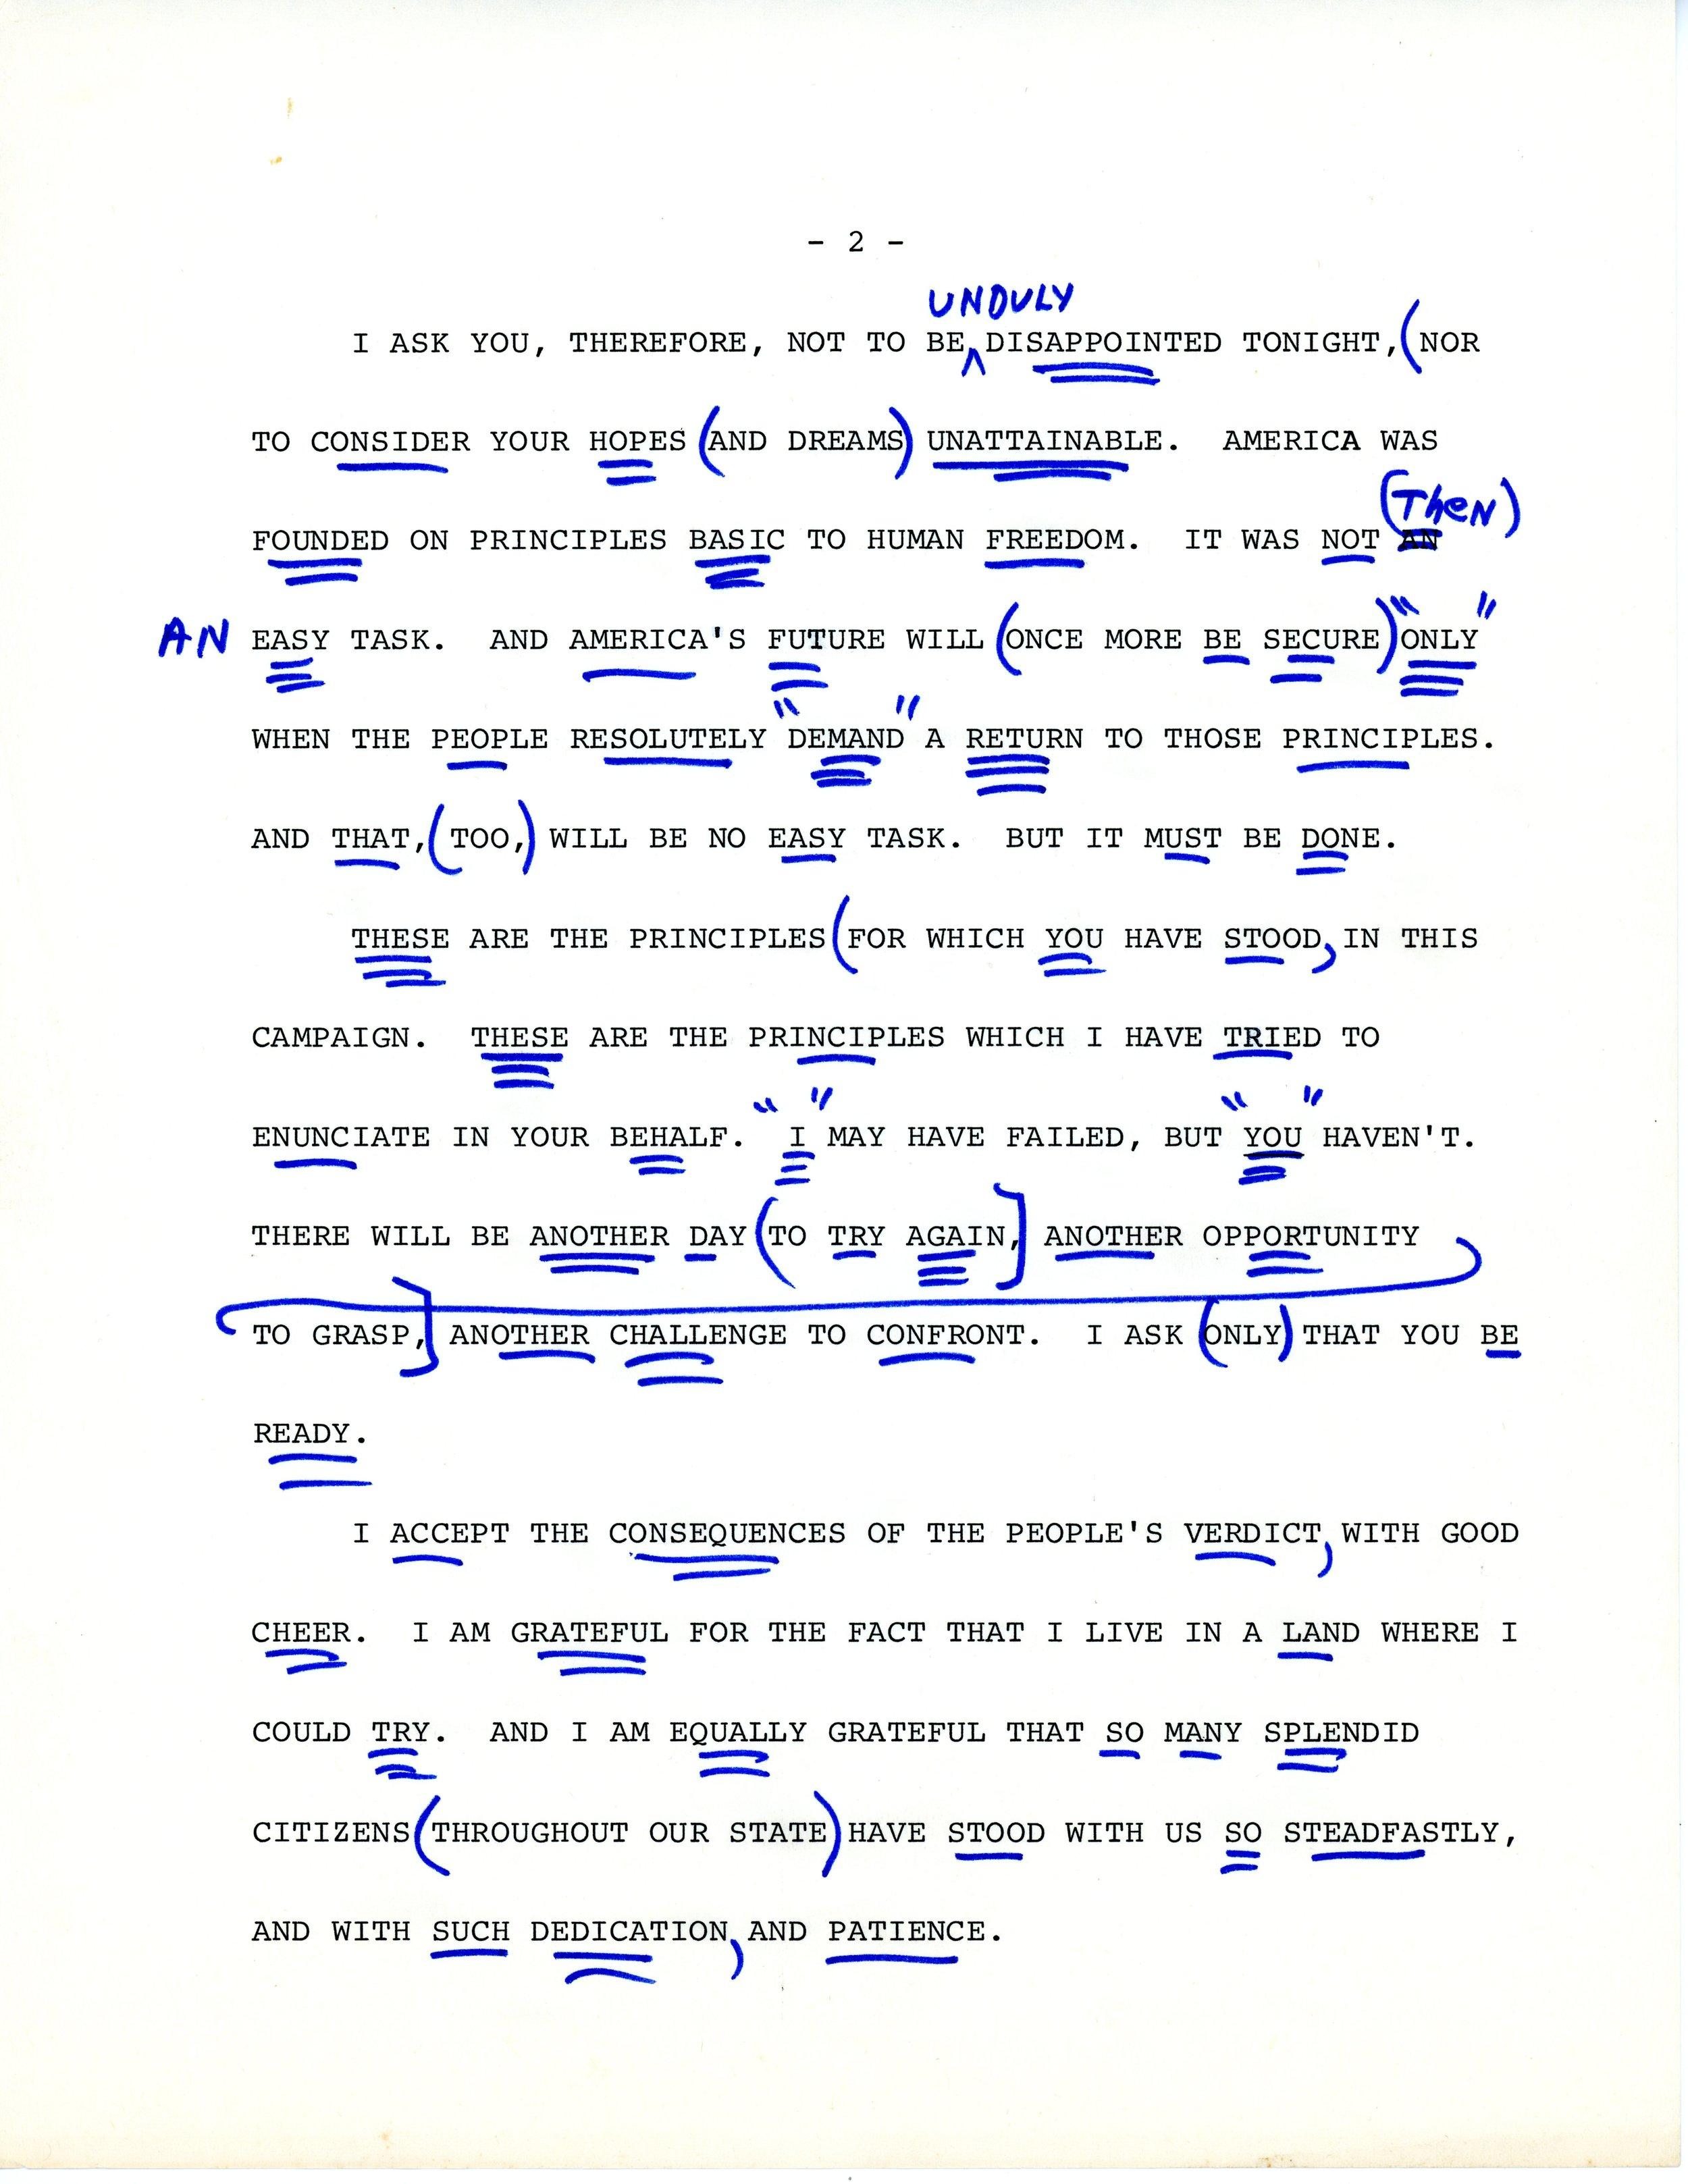 Helms 1972 Concession Speech002.jpg